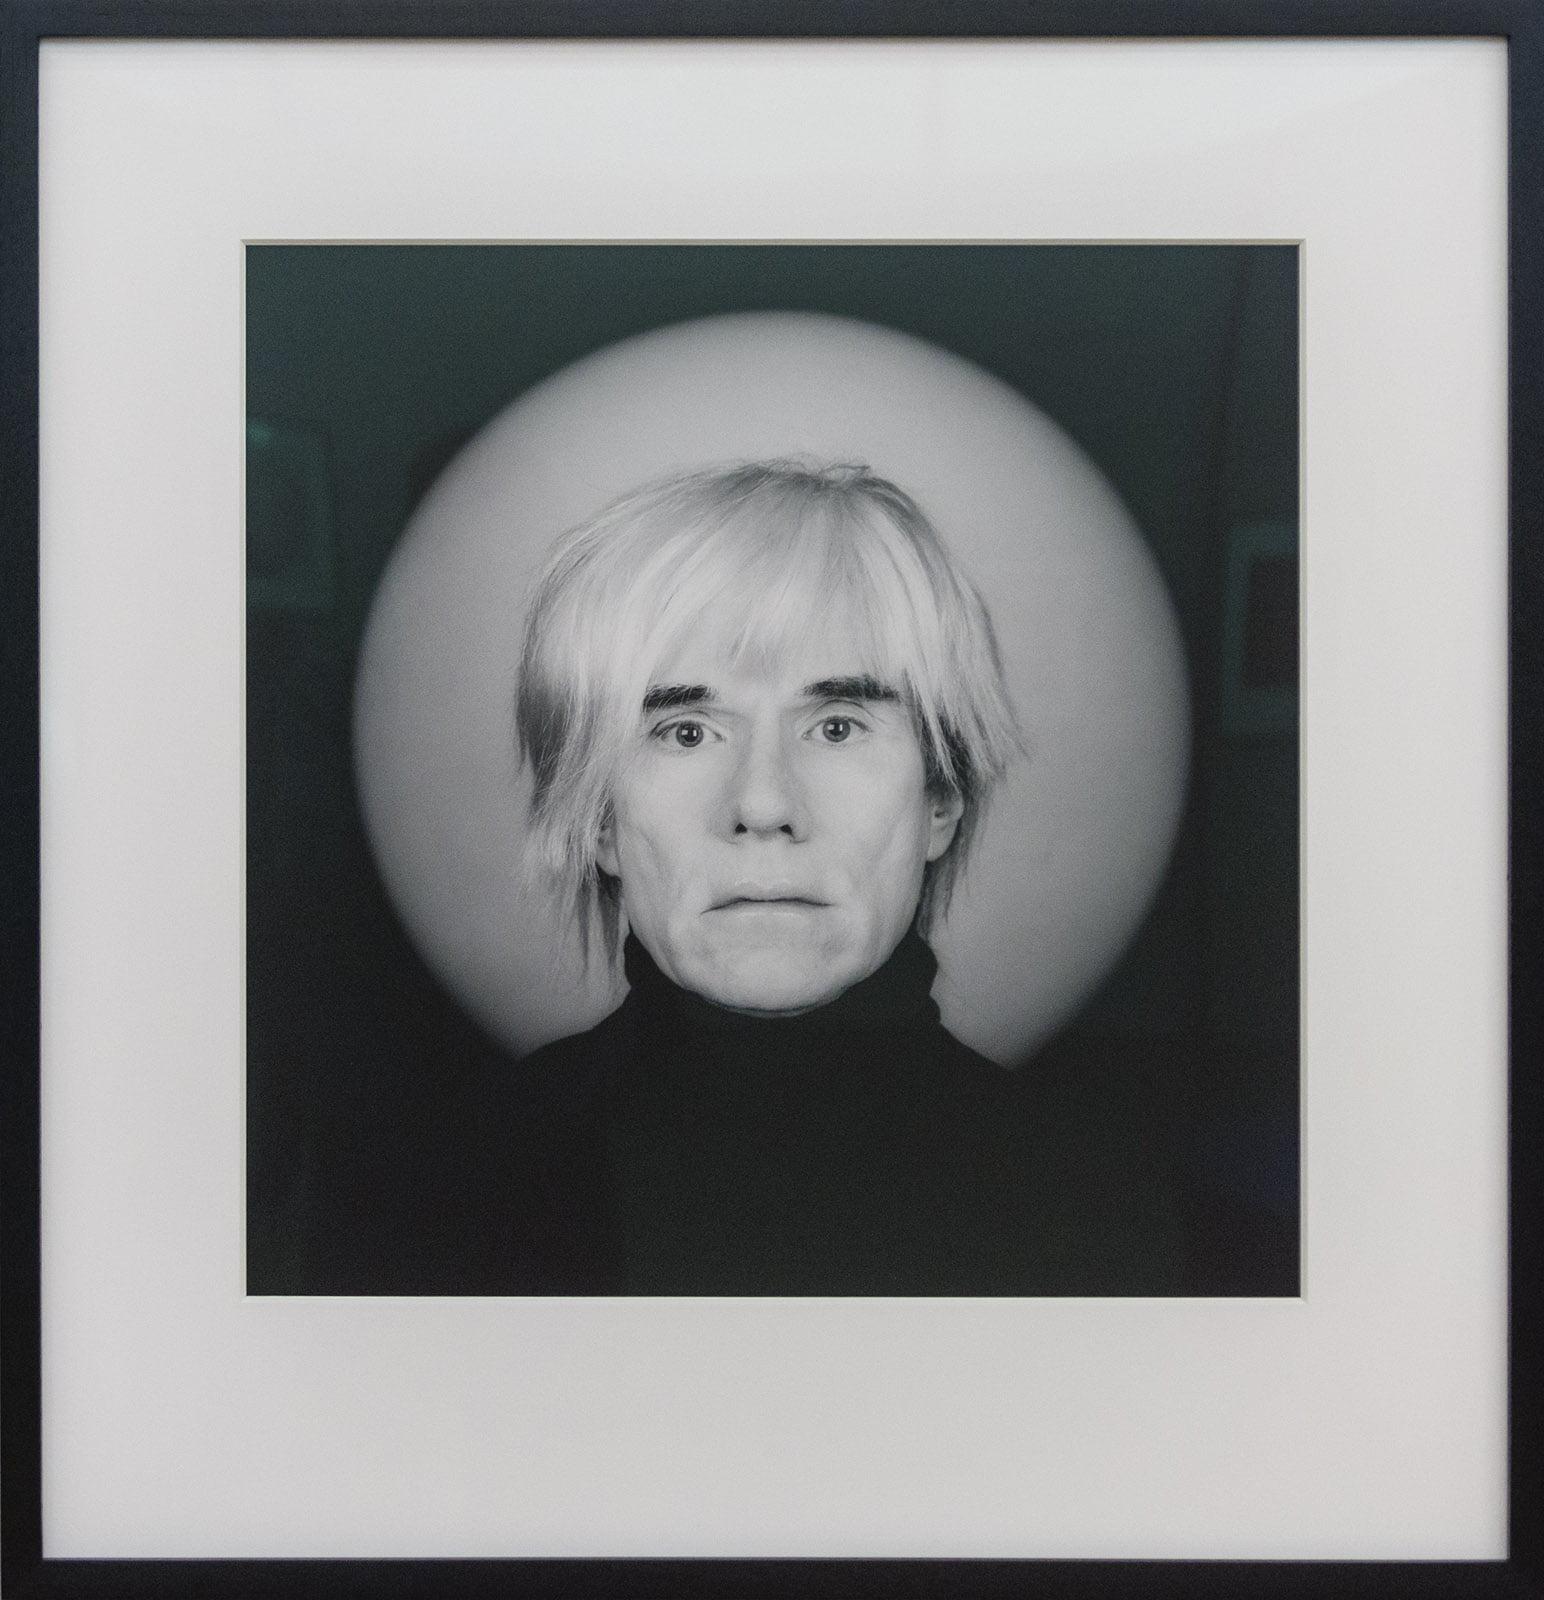 Kunsthal, Rotterdam, Robert Mapplethorpe, Andy Warhol